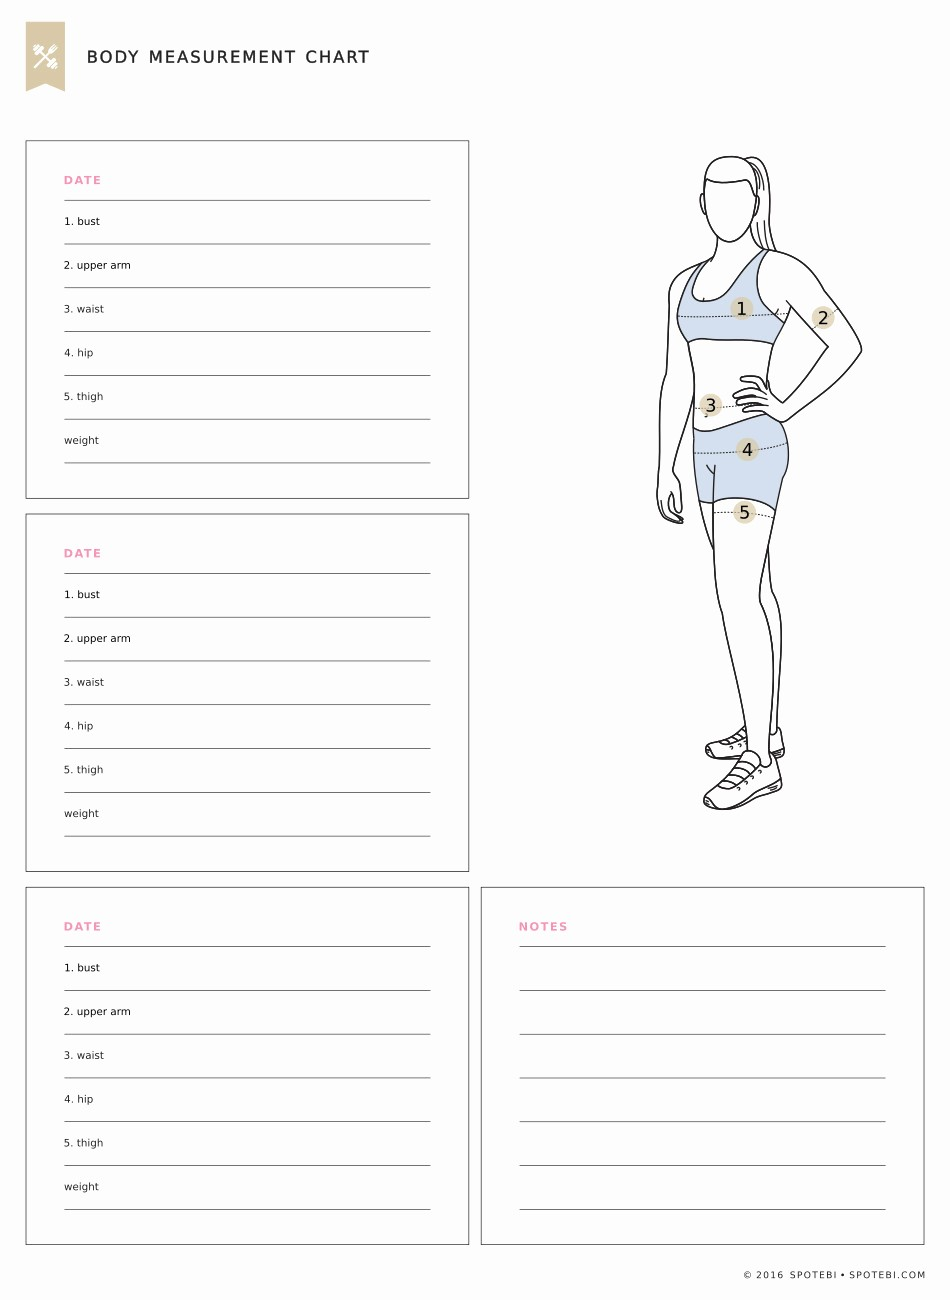 Weight Loss Chart for Women Beautiful Body Measurement Chart